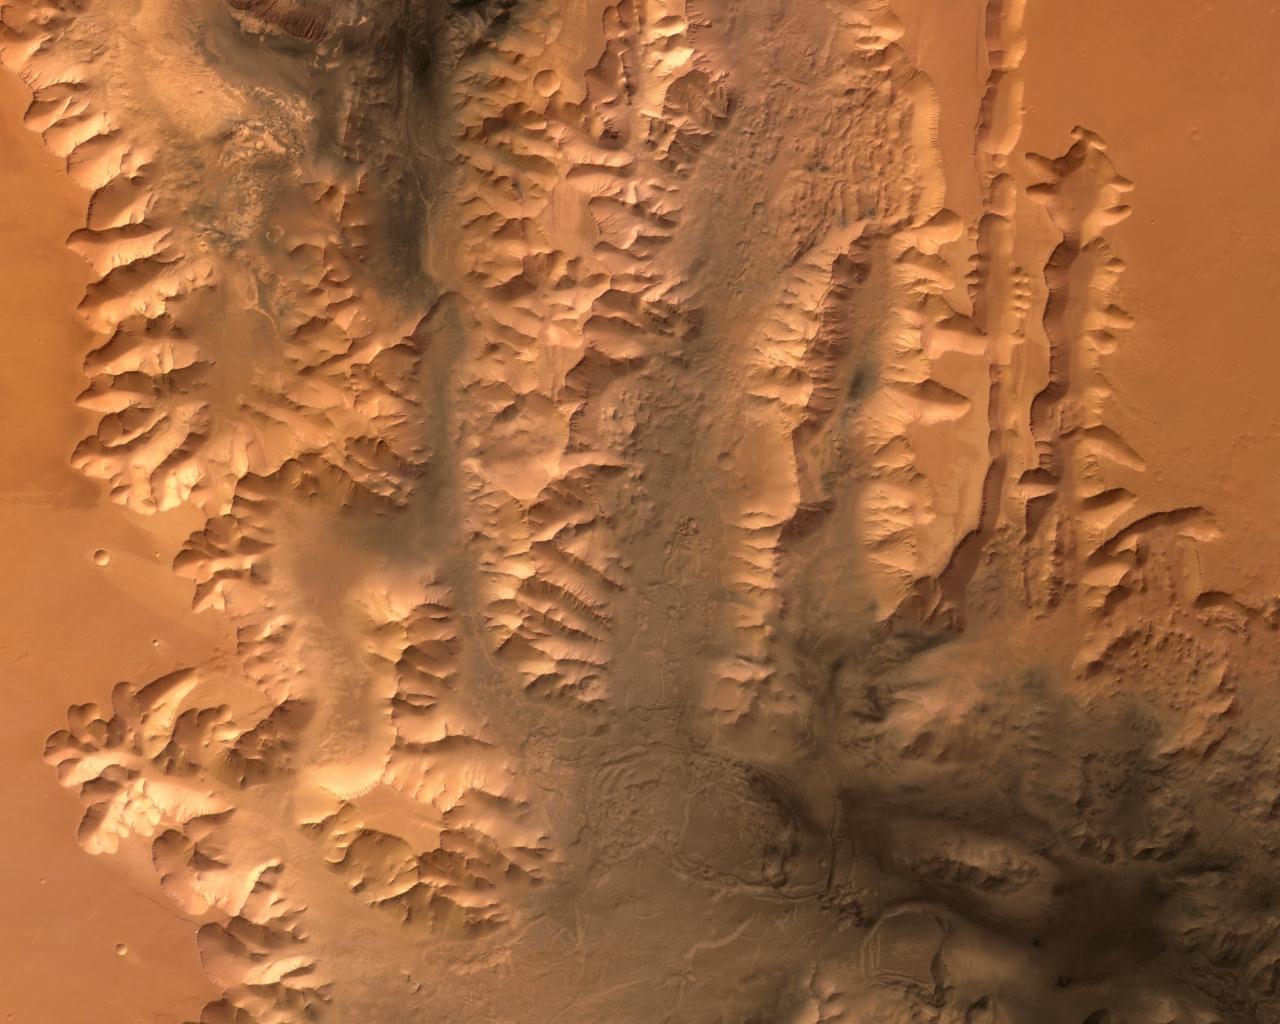 1567218152477-Tithonium_Chasma-wallpaper.jpg